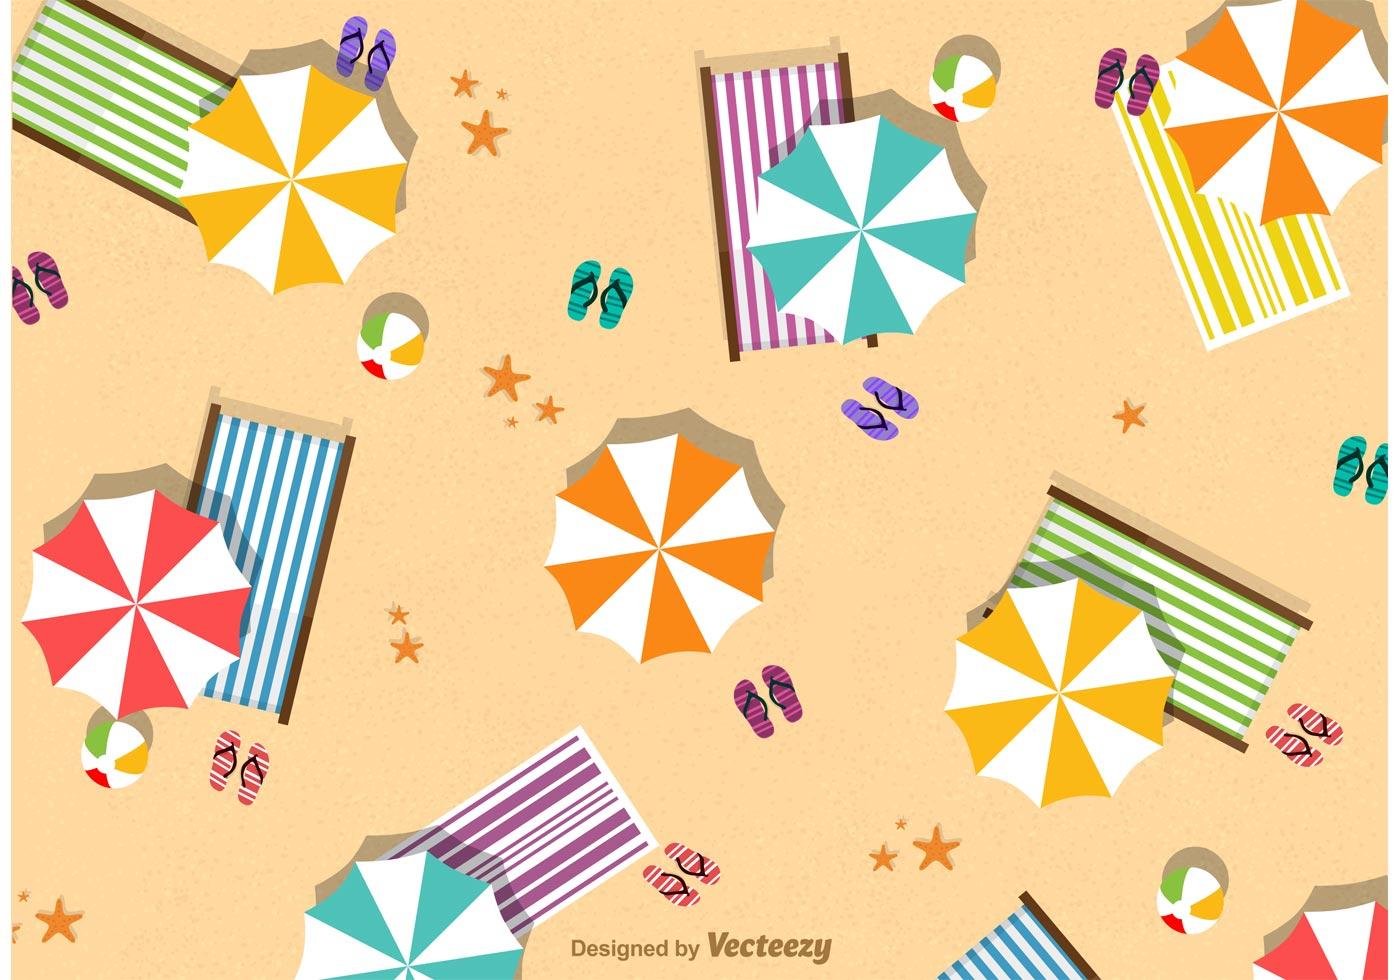 Summer Beach Umbrella Vector - Download Free Vector Art ...